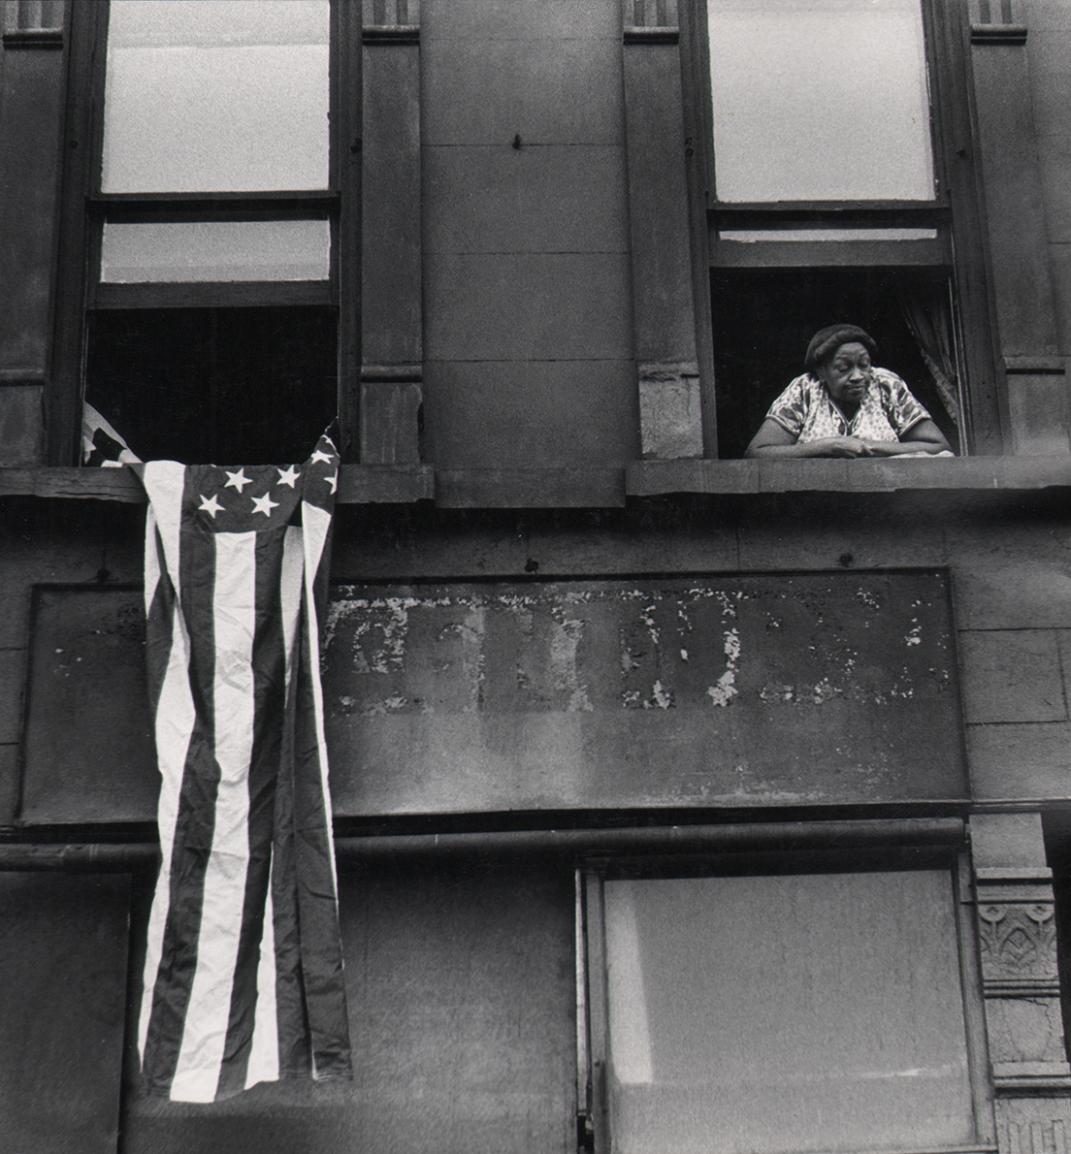 Beuford Smith, Flag Day, Harlem, 1976